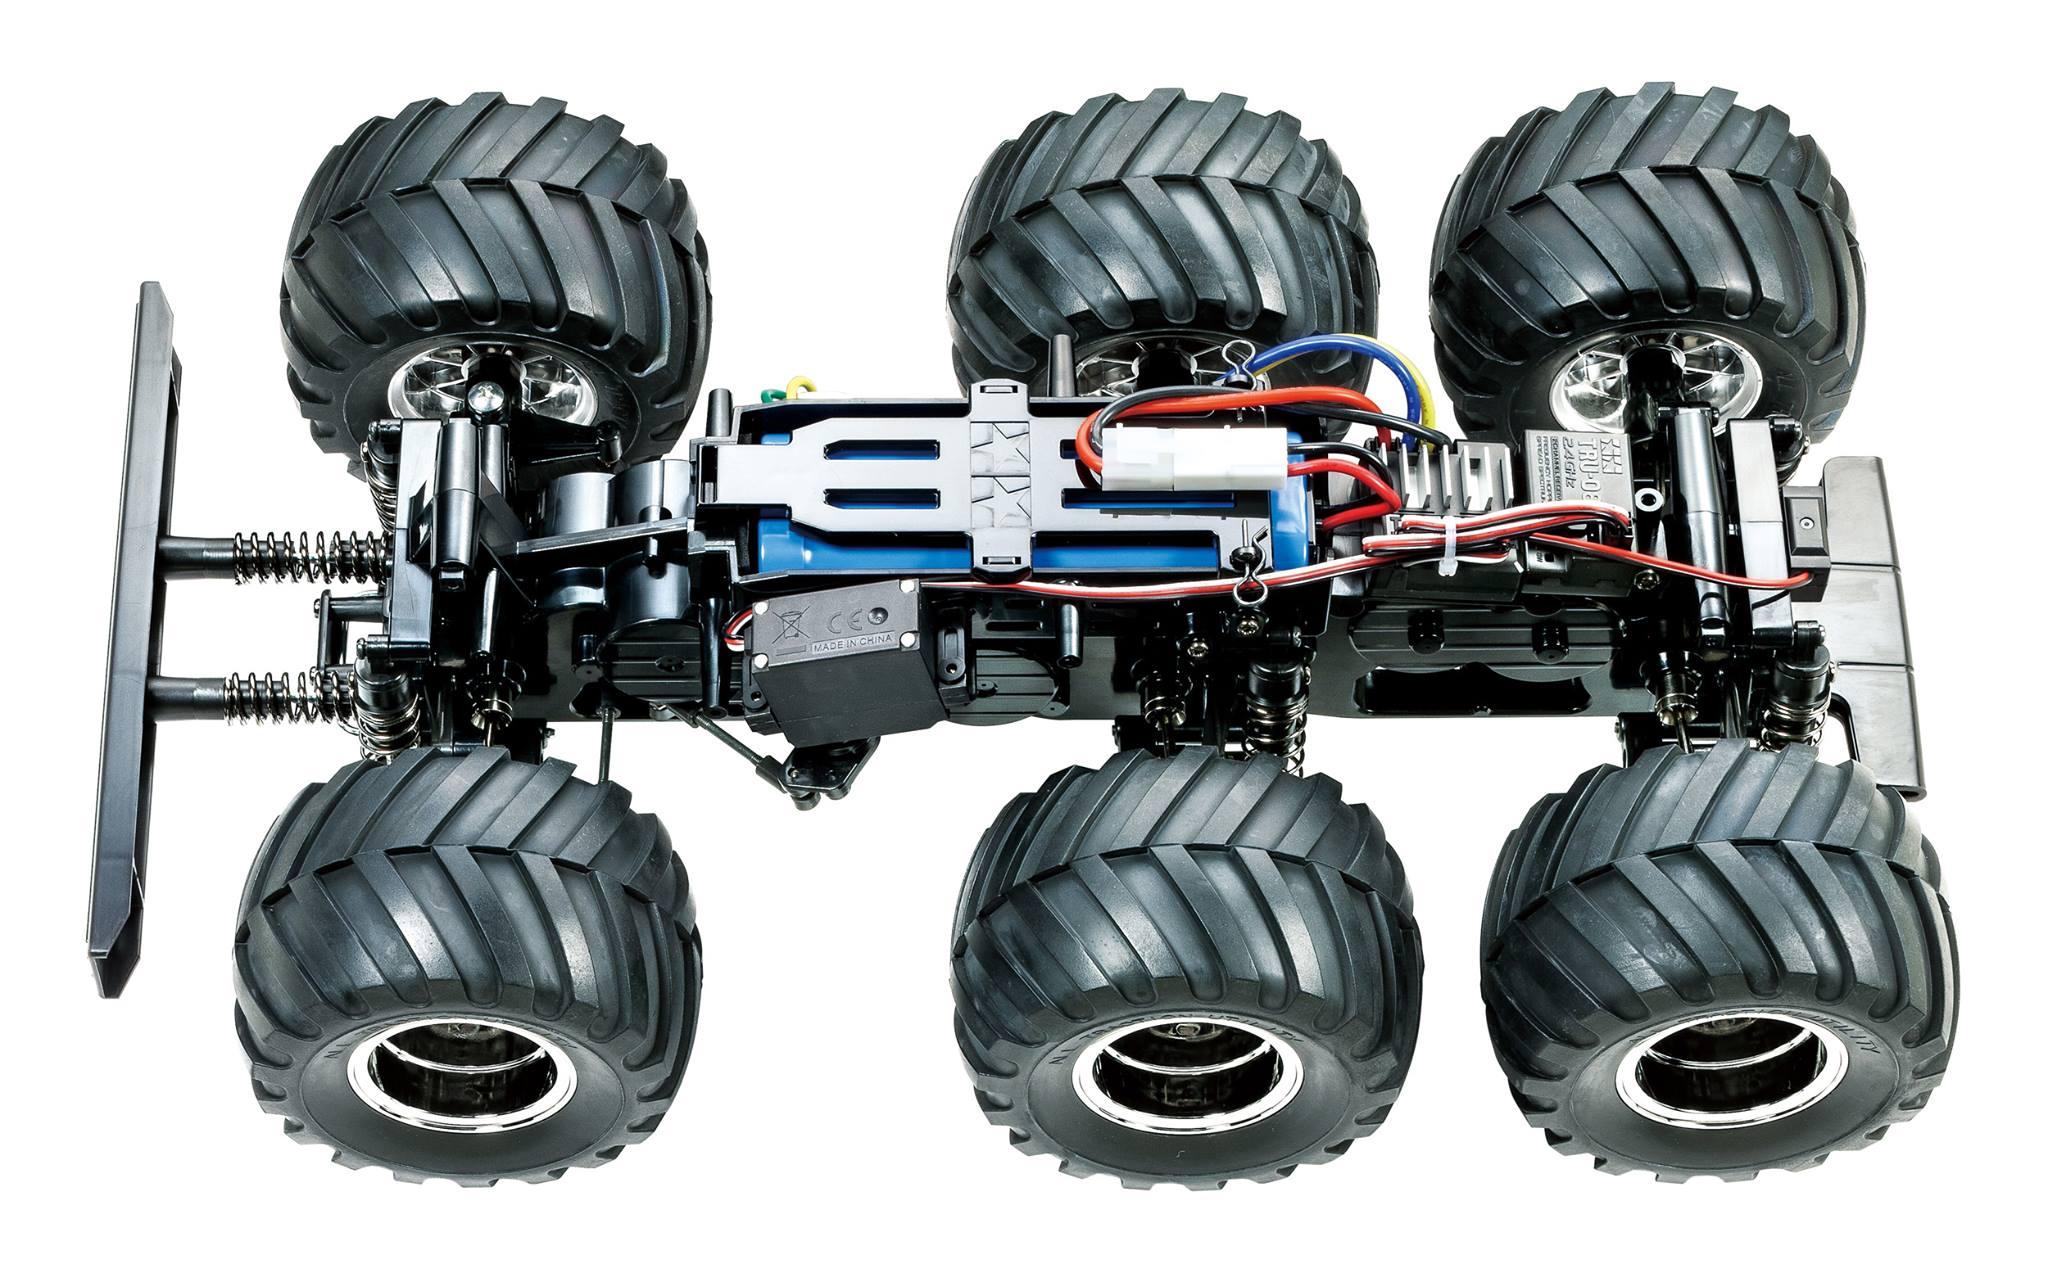 Tamiya KongHead 6X6 monster truck